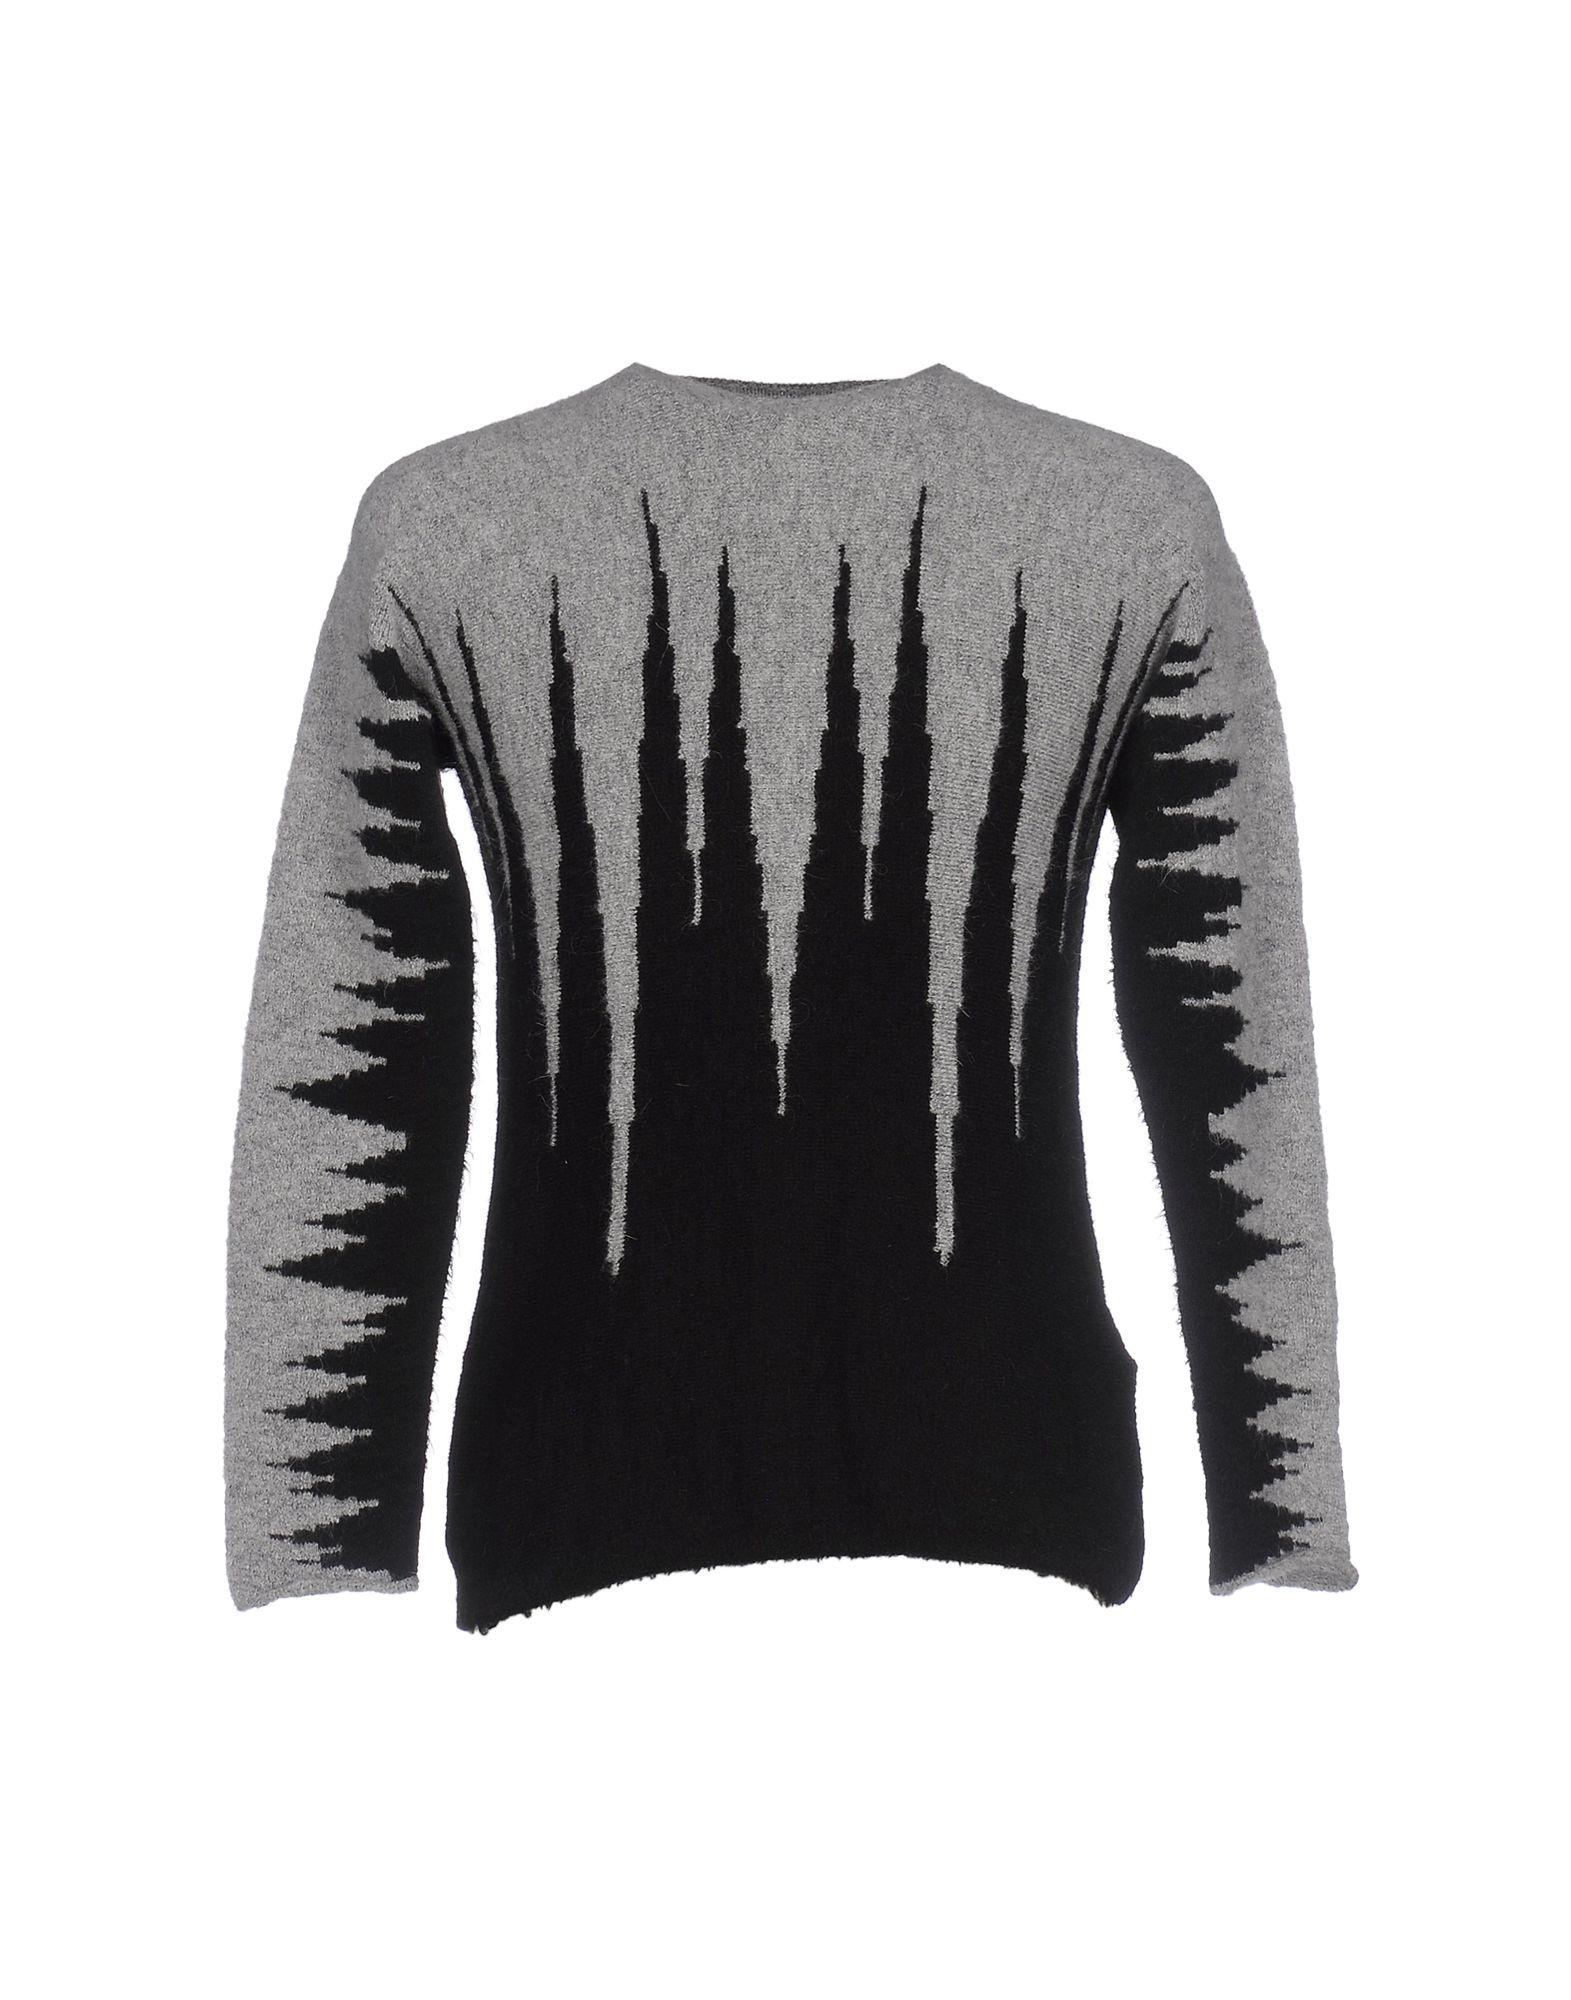 Pullover Tom Rebl Uomo - Acquista online su